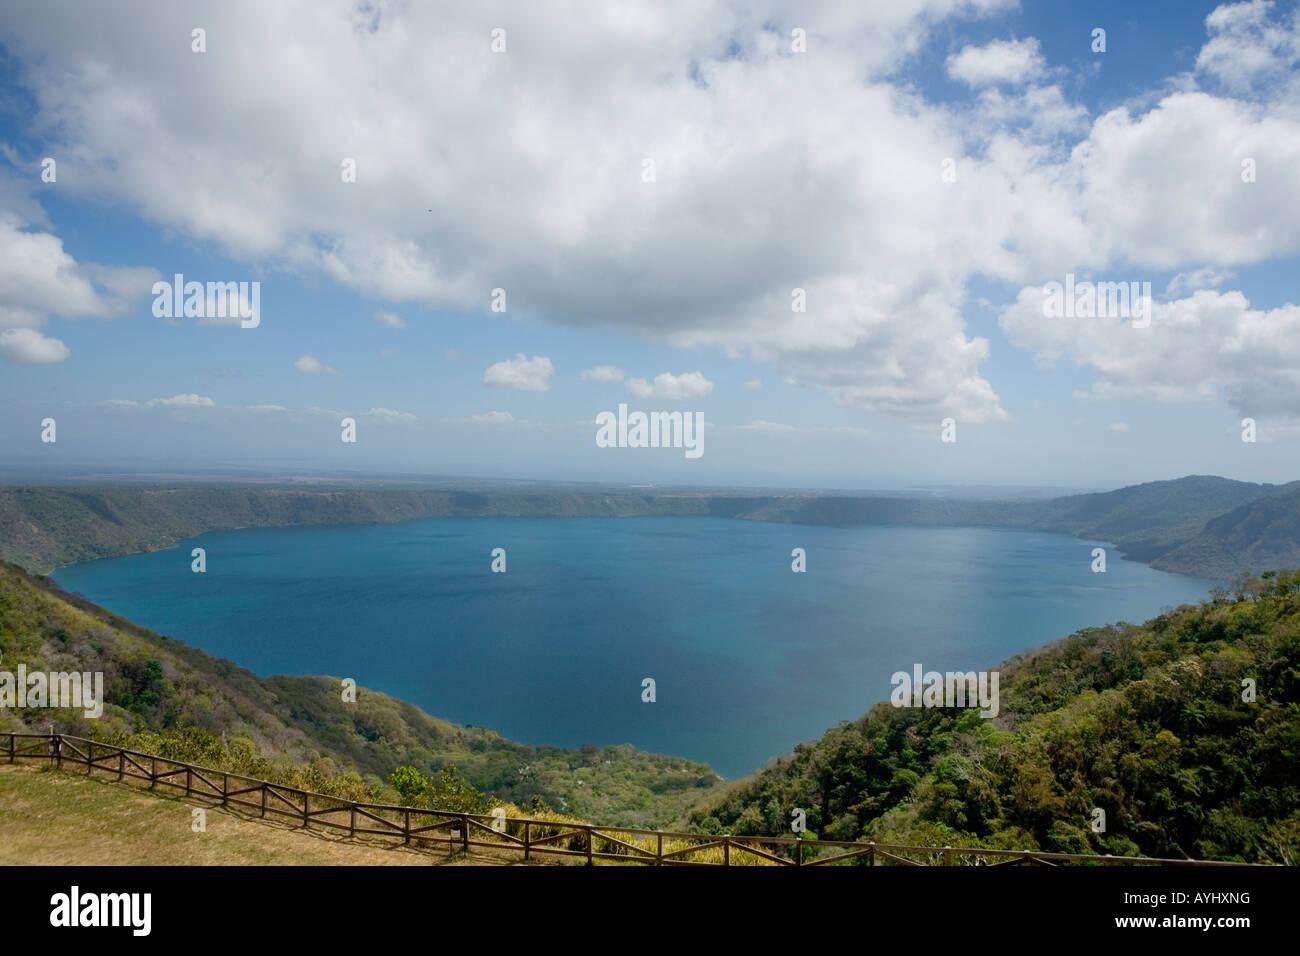 Laguna de Apoyo crater lake Catarina Mirador Nicaragua - Stock Image